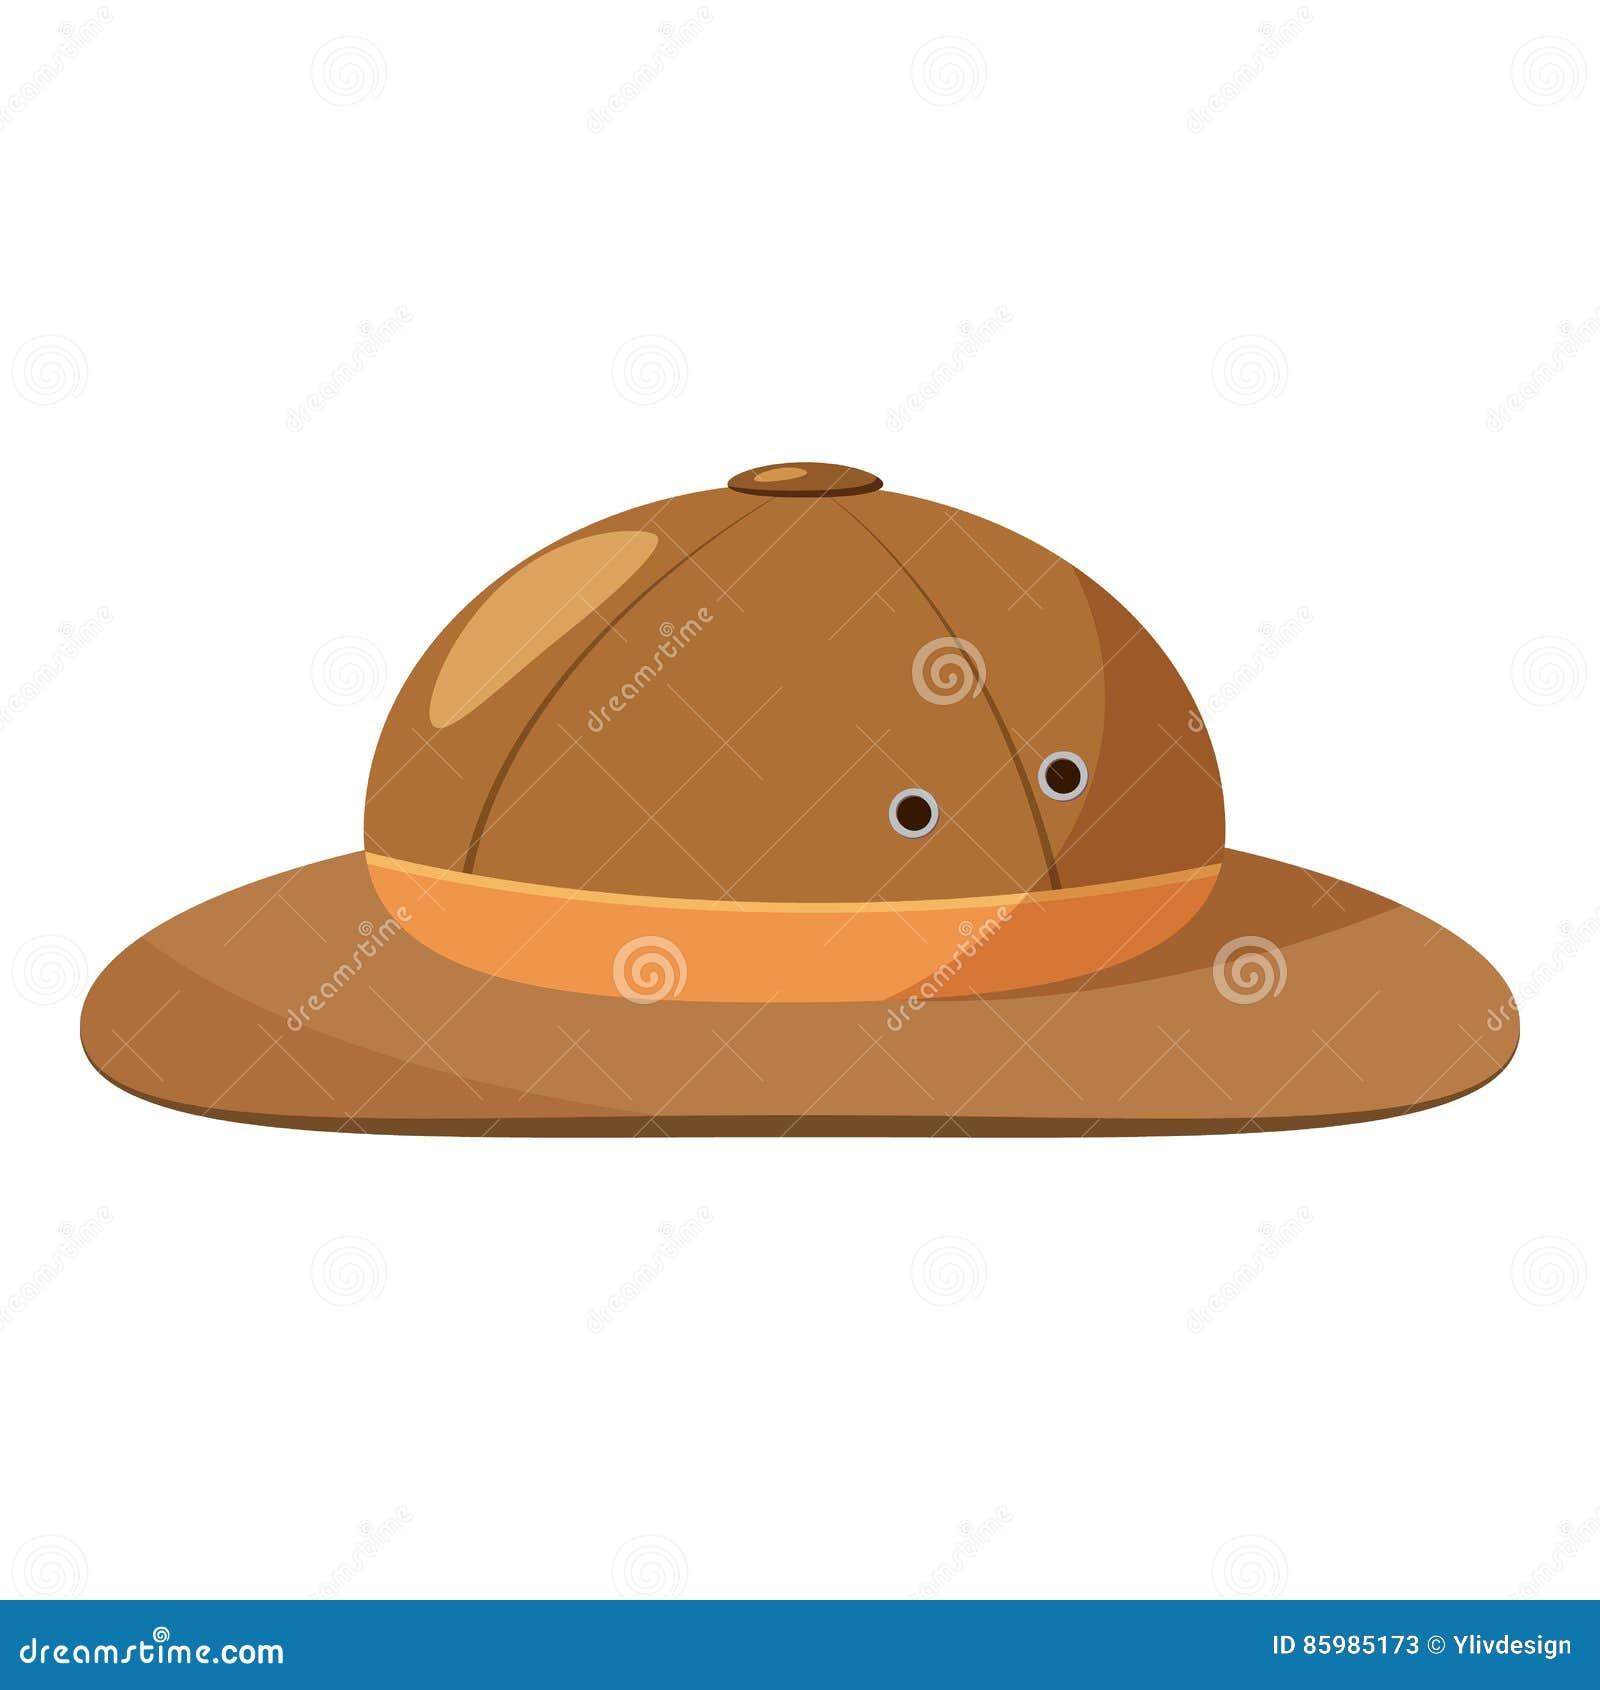 e6ed3df69ccfe Men Hiking Hat Icon, Cartoon Style Stock Vector - Illustration of ...